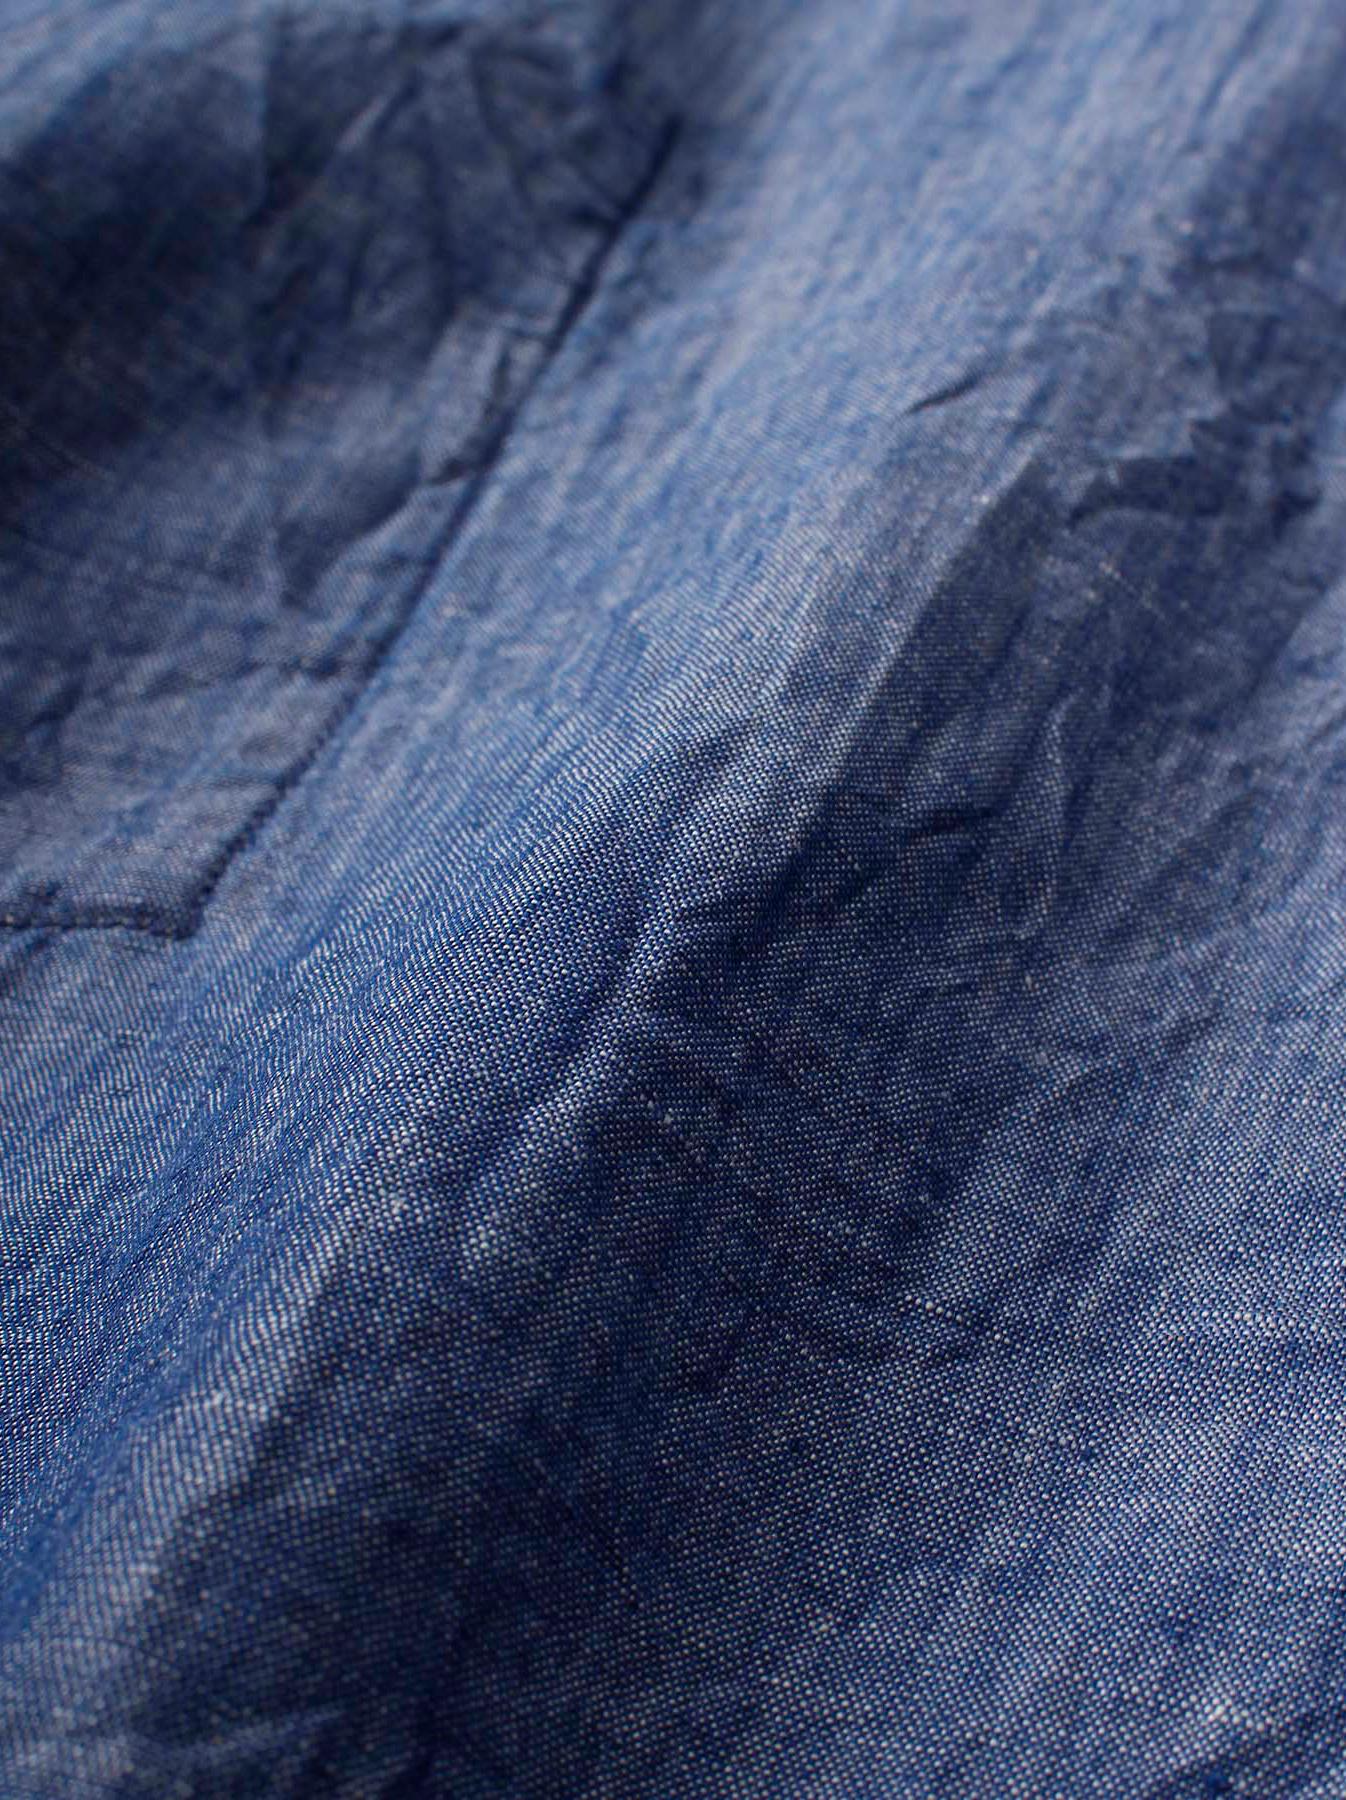 WH Cotton Linen Umahiko Pullover Shirt-6